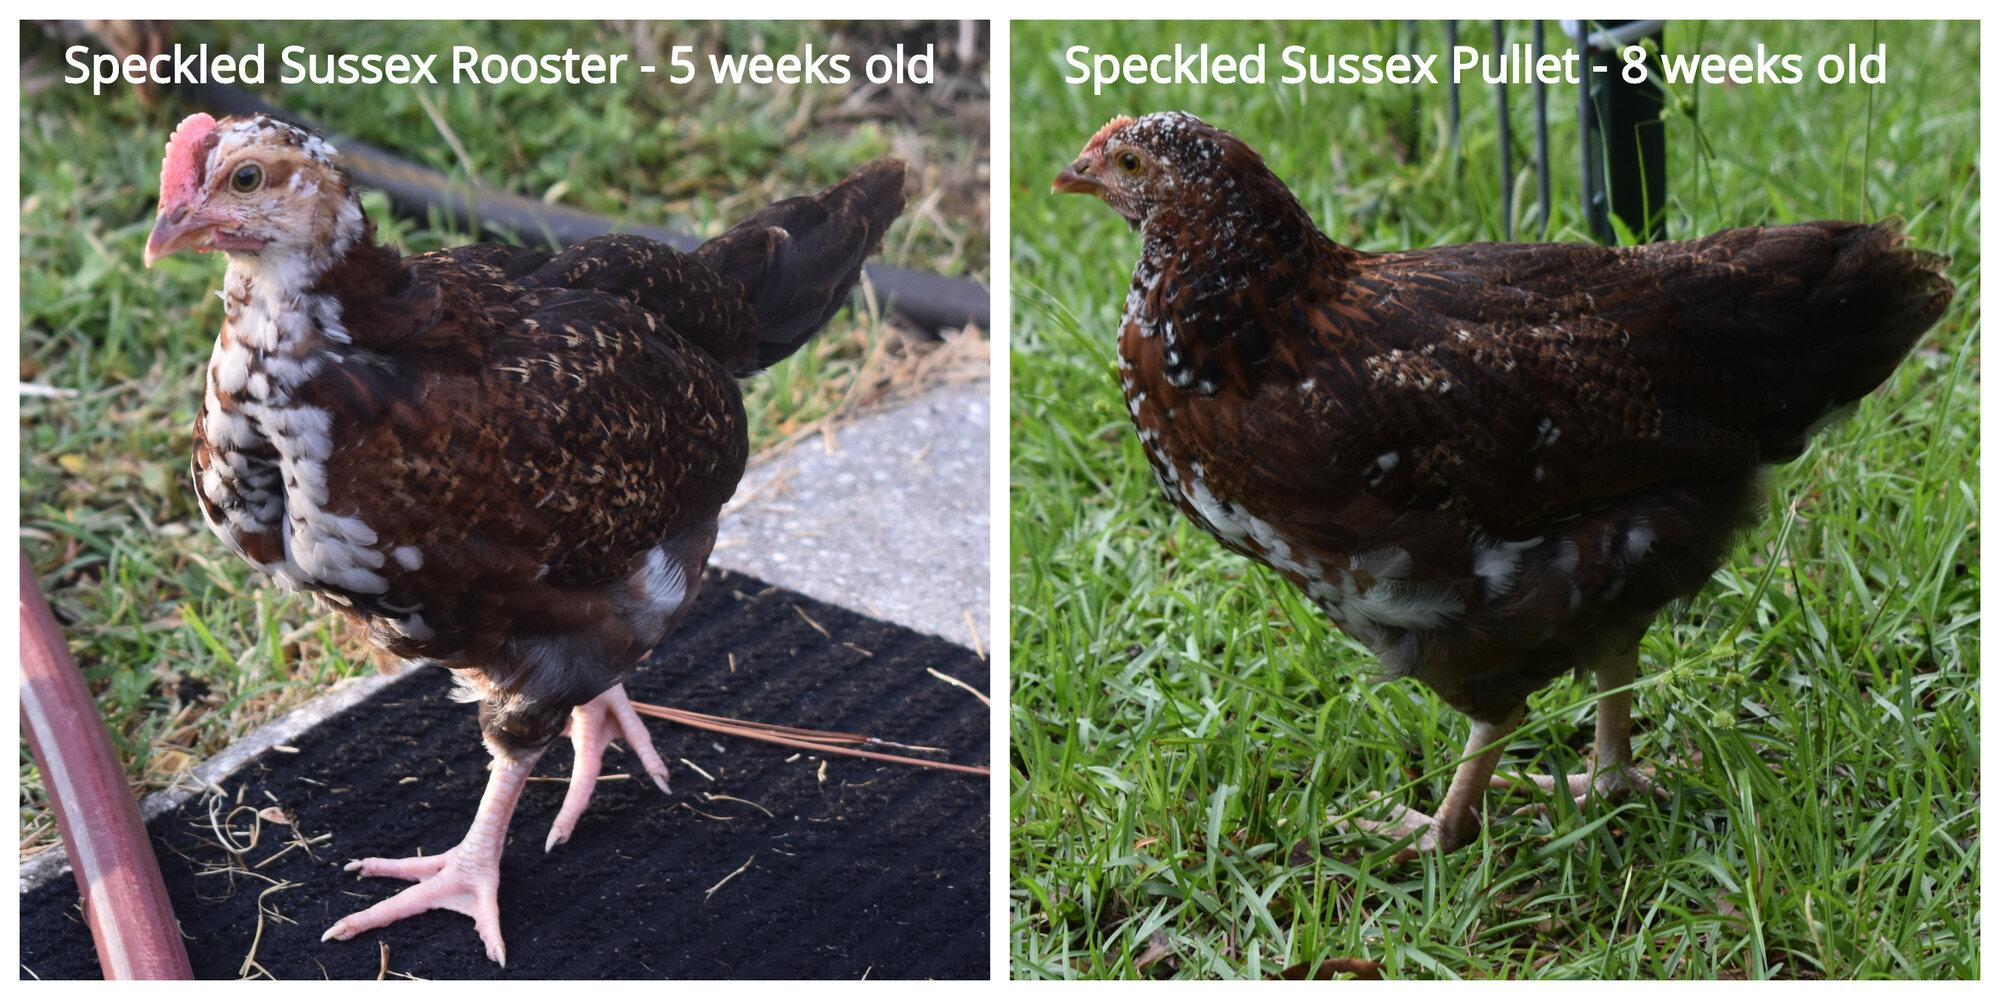 Speckled Sussex Roo vs Pullet.jpg